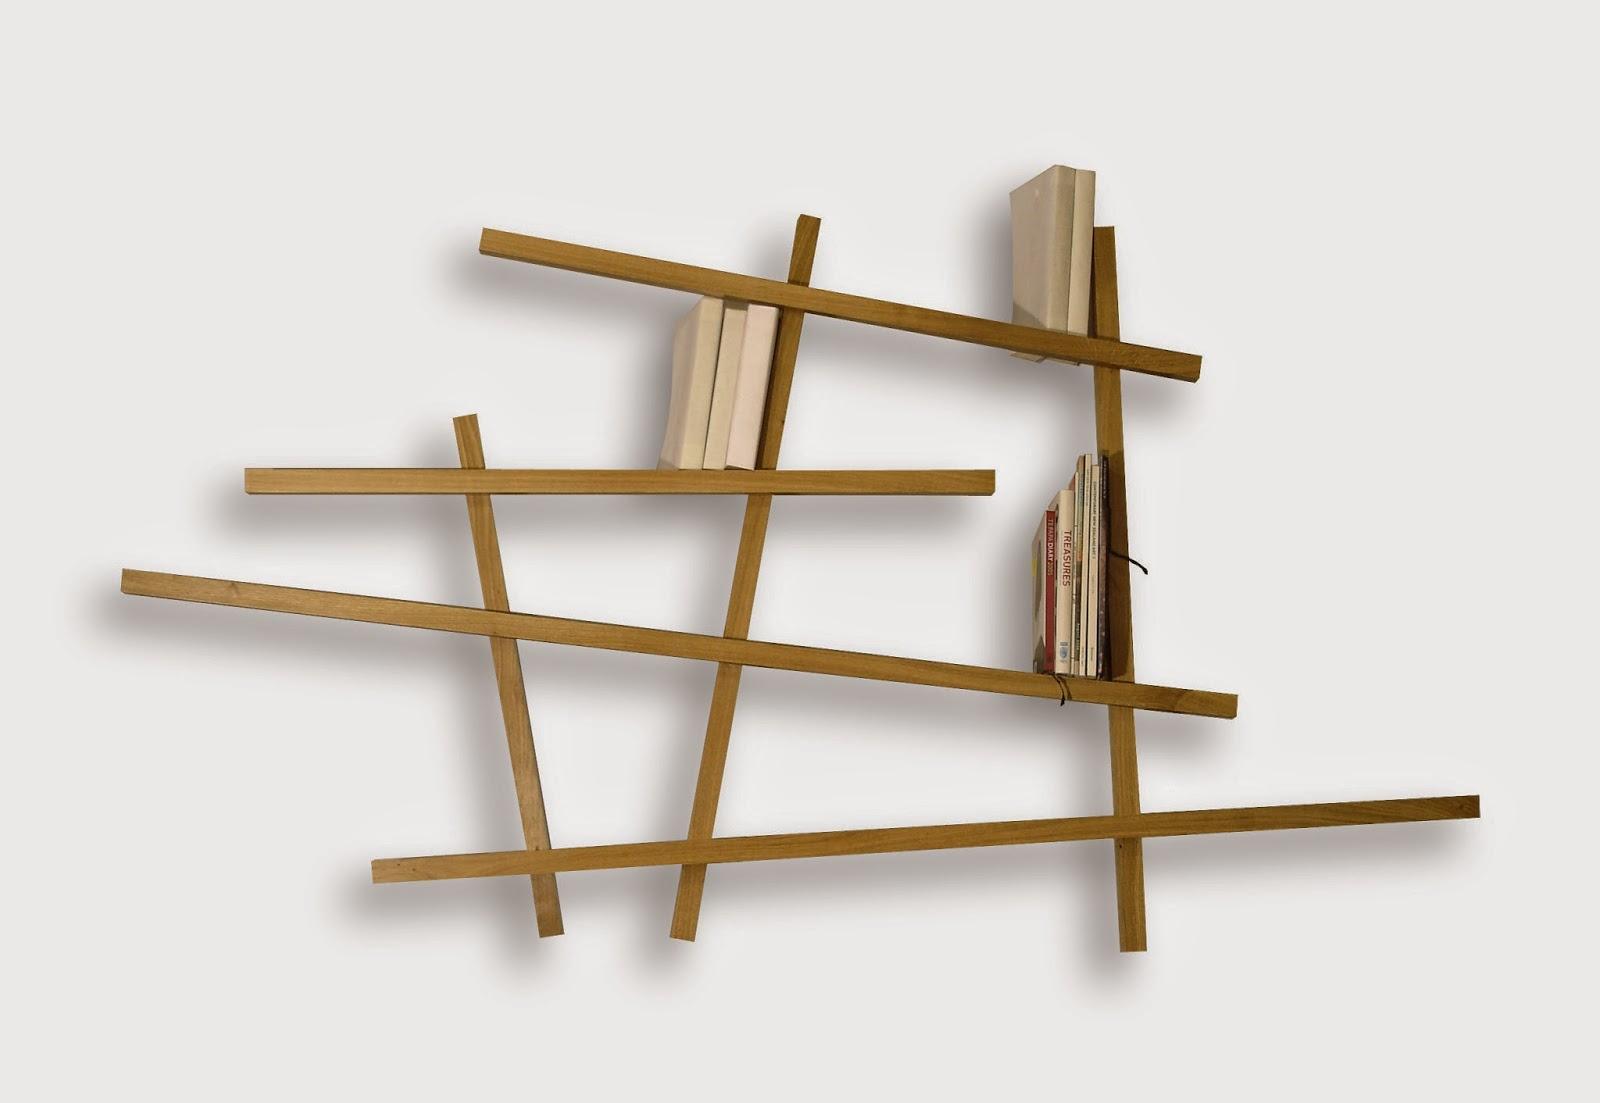 une semaine paris for t bricoler une tag re design bluffante. Black Bedroom Furniture Sets. Home Design Ideas